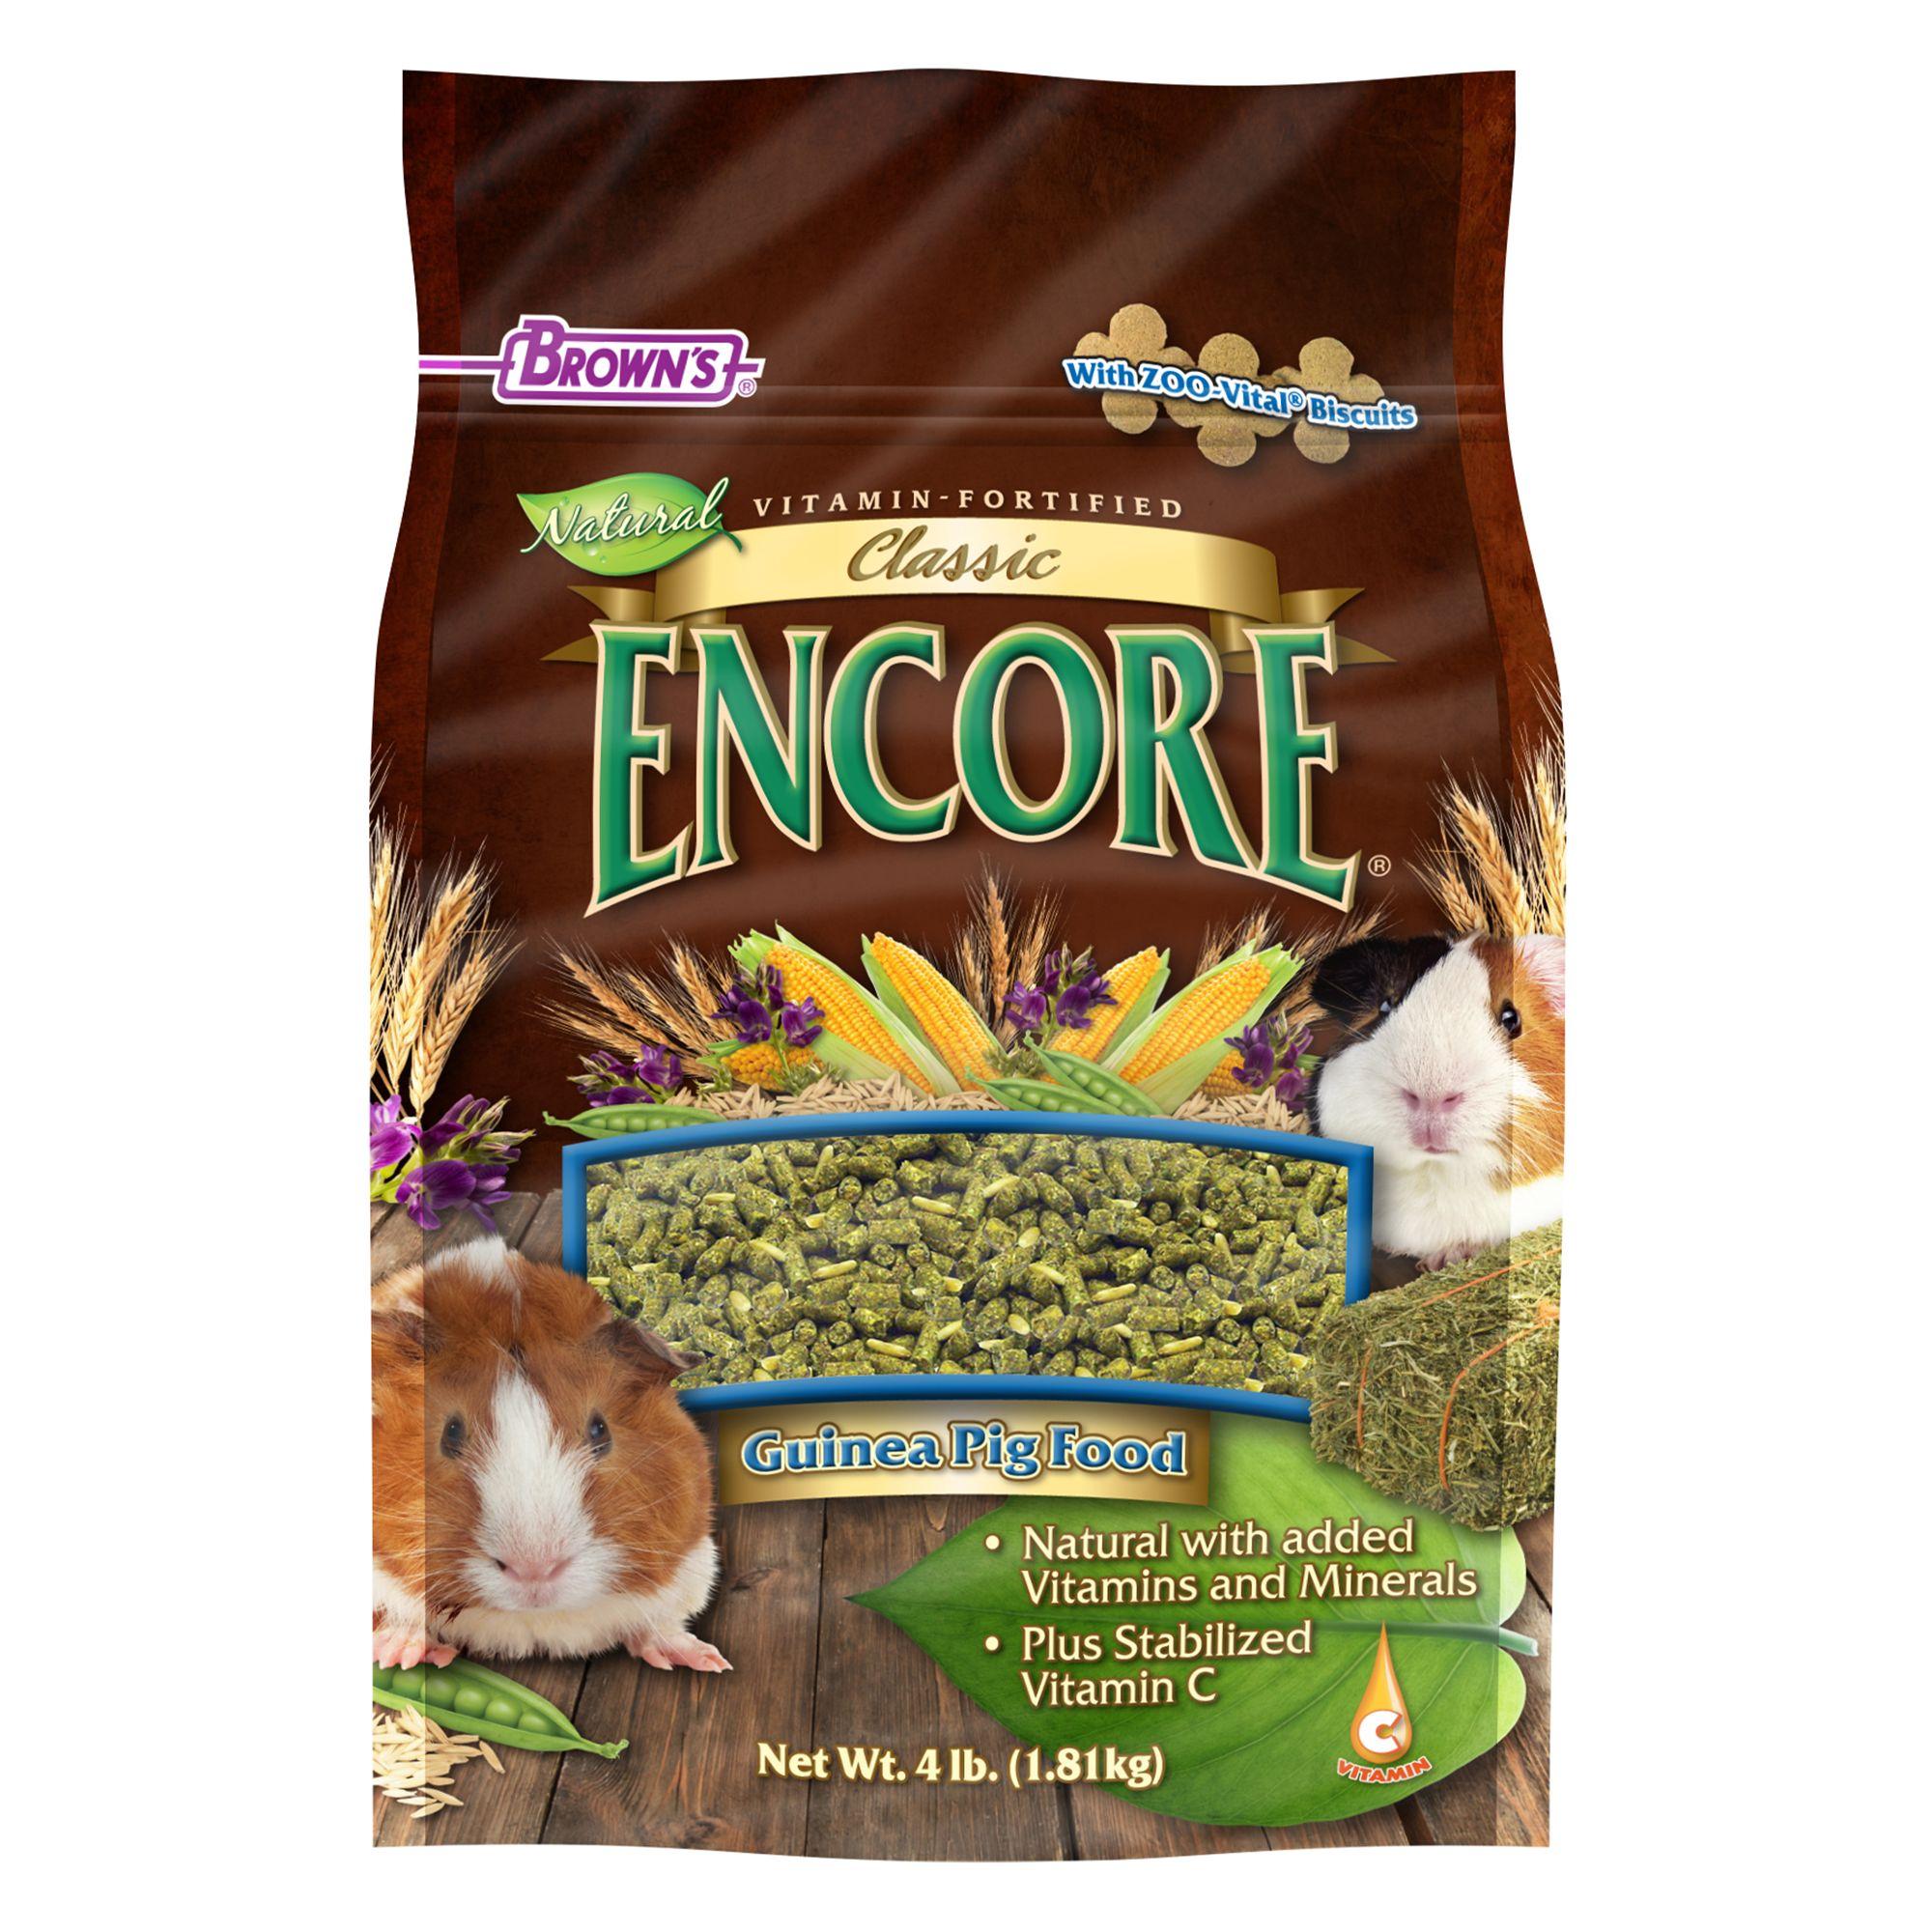 Browns Encore Classic Natural Guinea Pig Food Size 4 Lb Fm Browns